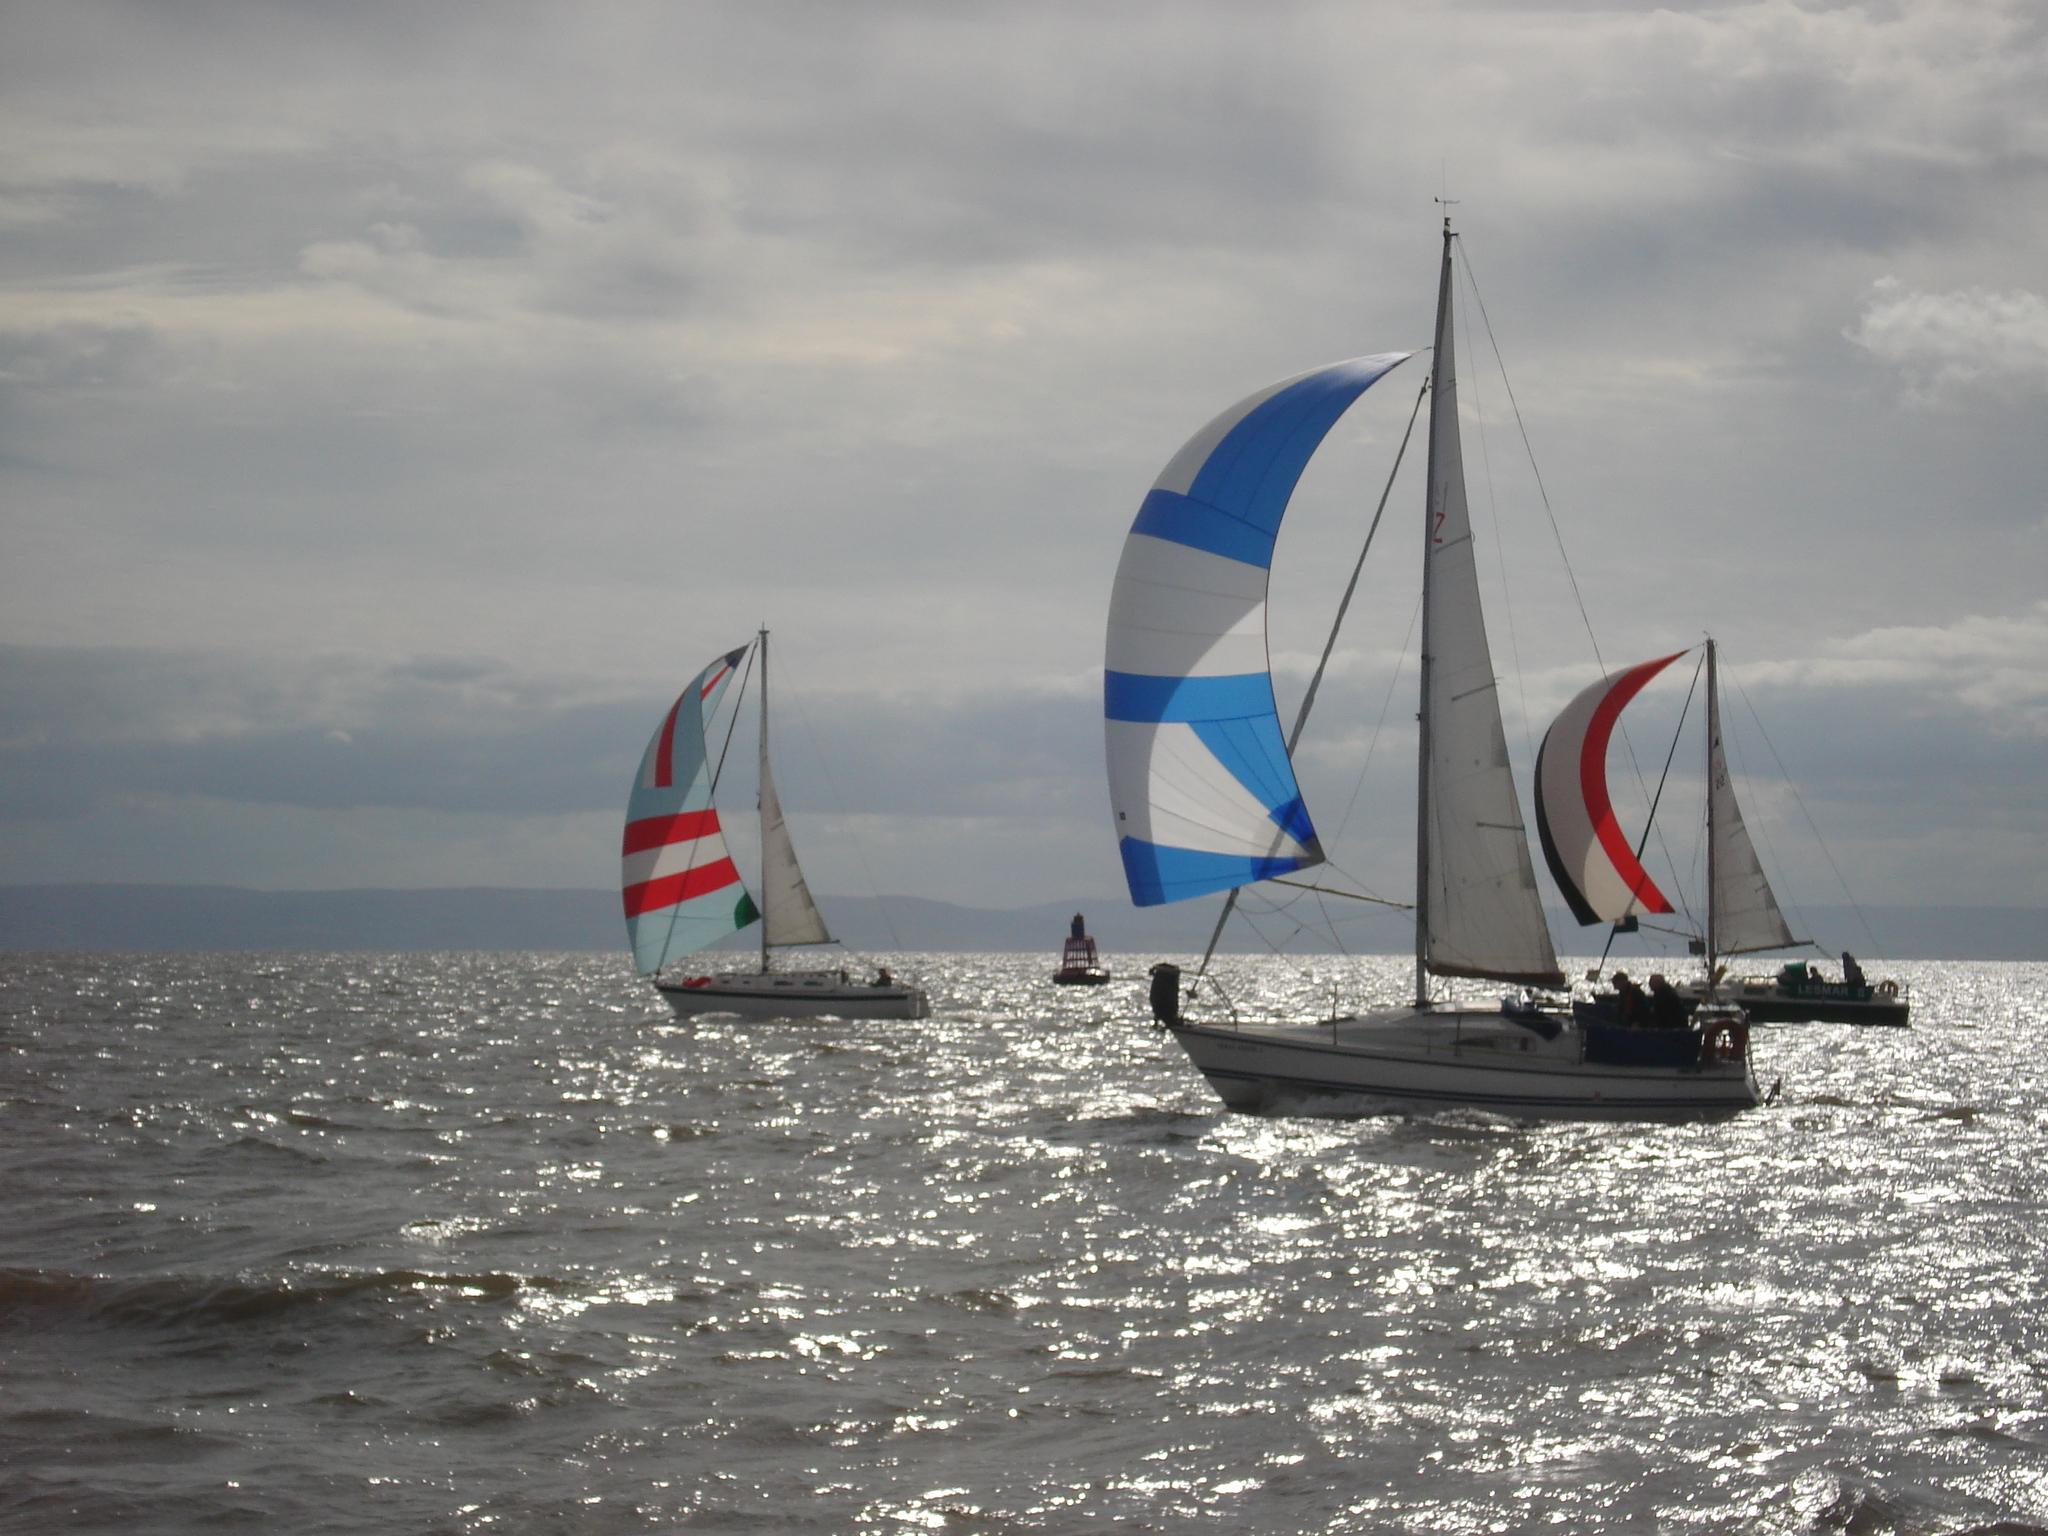 Racing yachts.